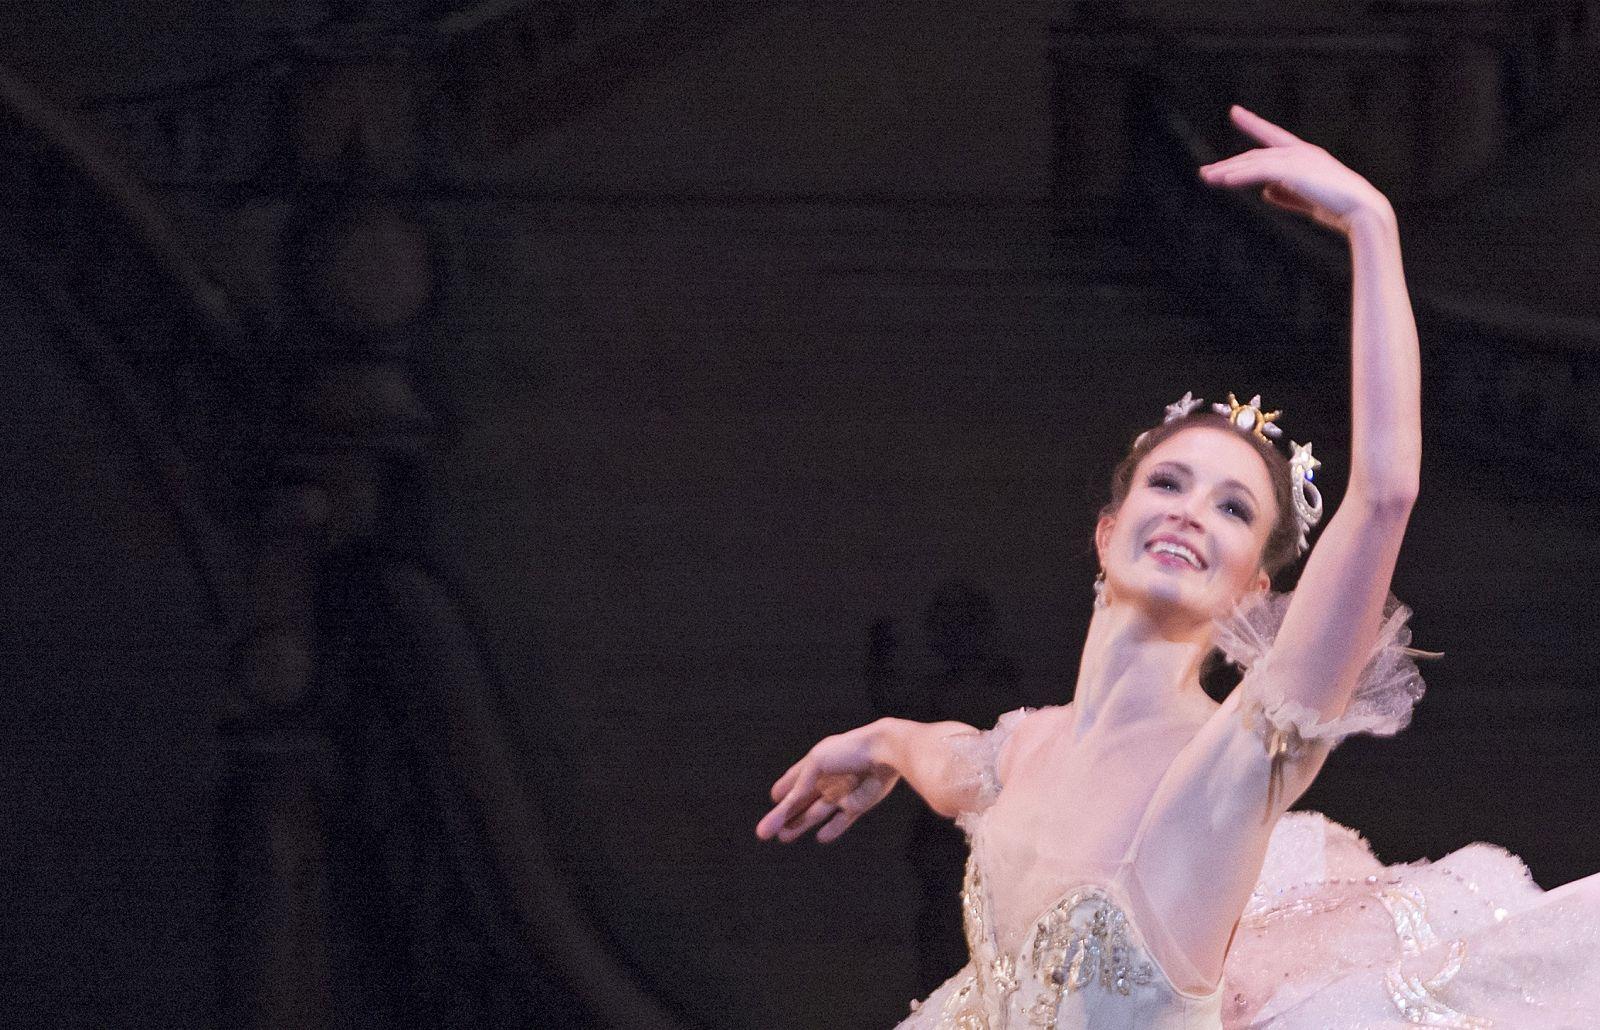 Credit: Tristram Kenton / Royal Opera House / ArenaPAL